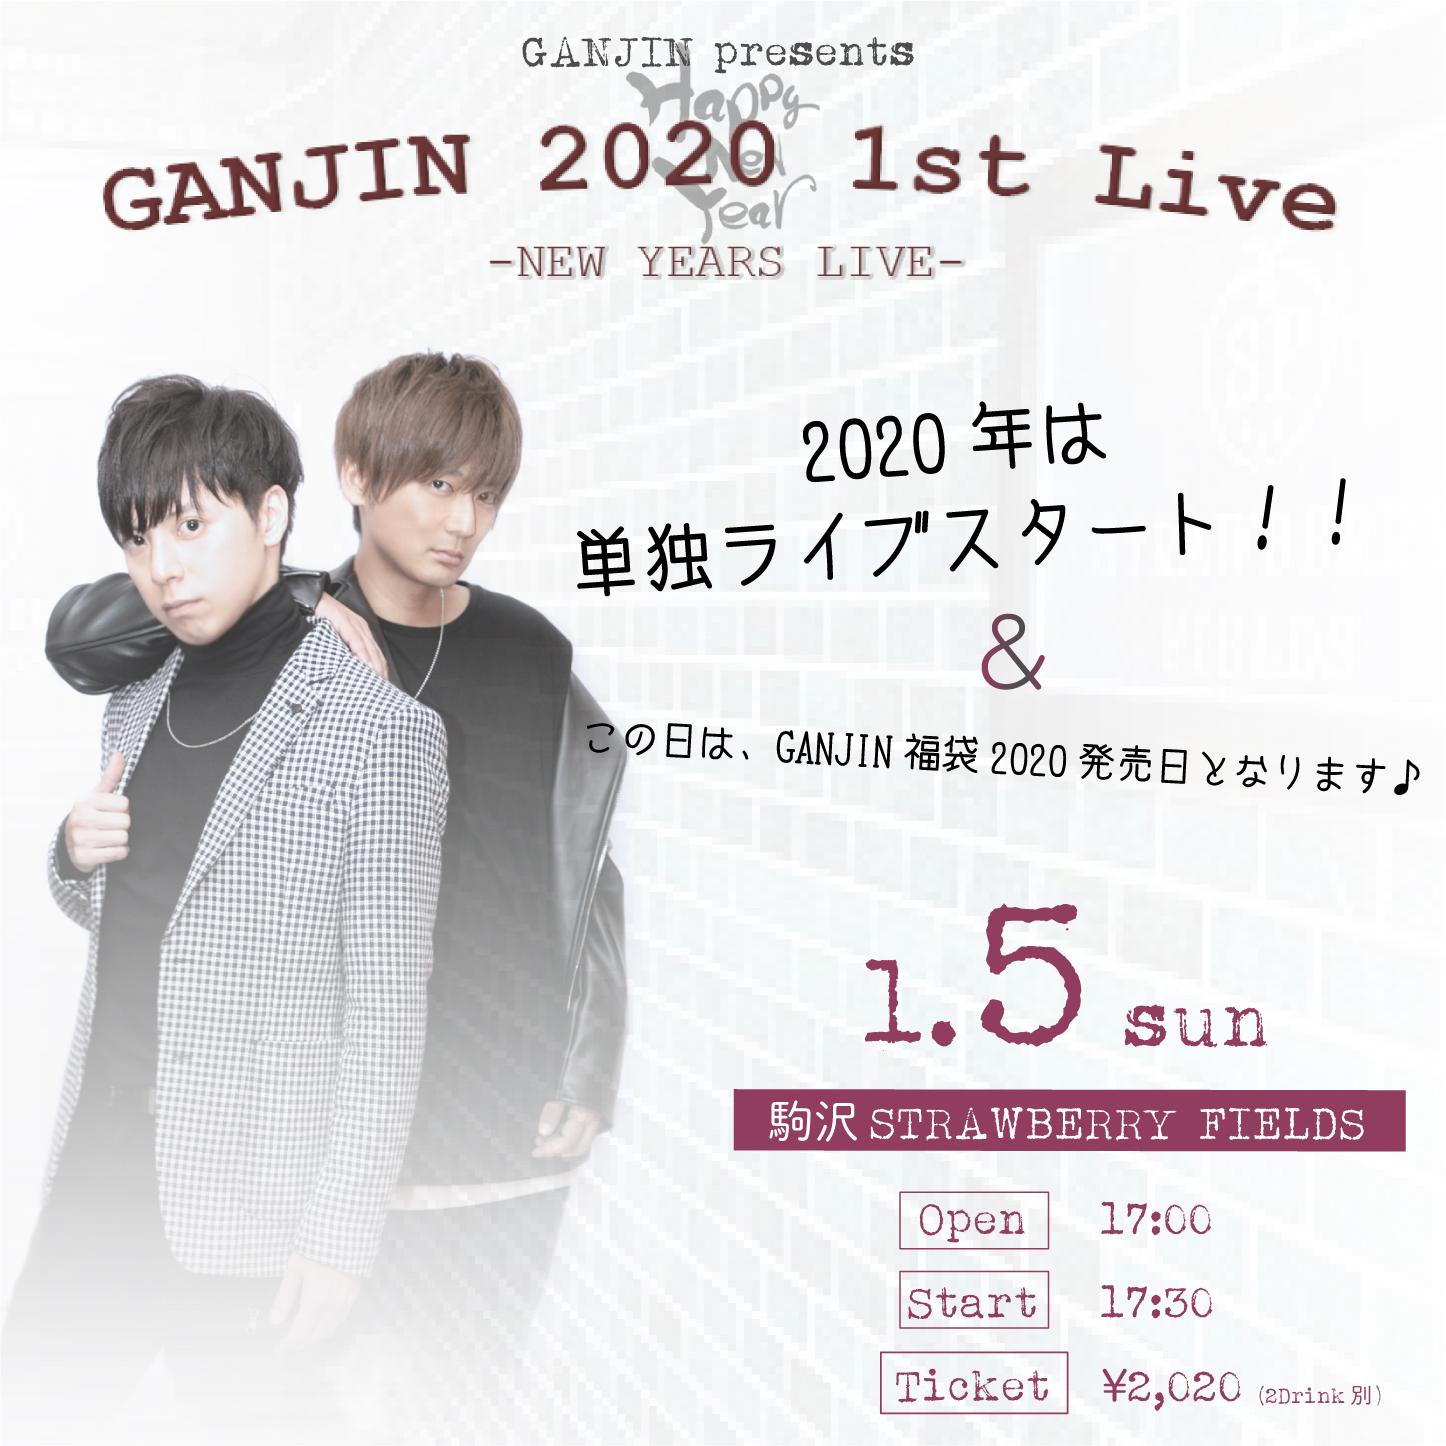 GANJIN  presents「GANJIN 2020 1st Live〜NEW YEARS LIVE〜」